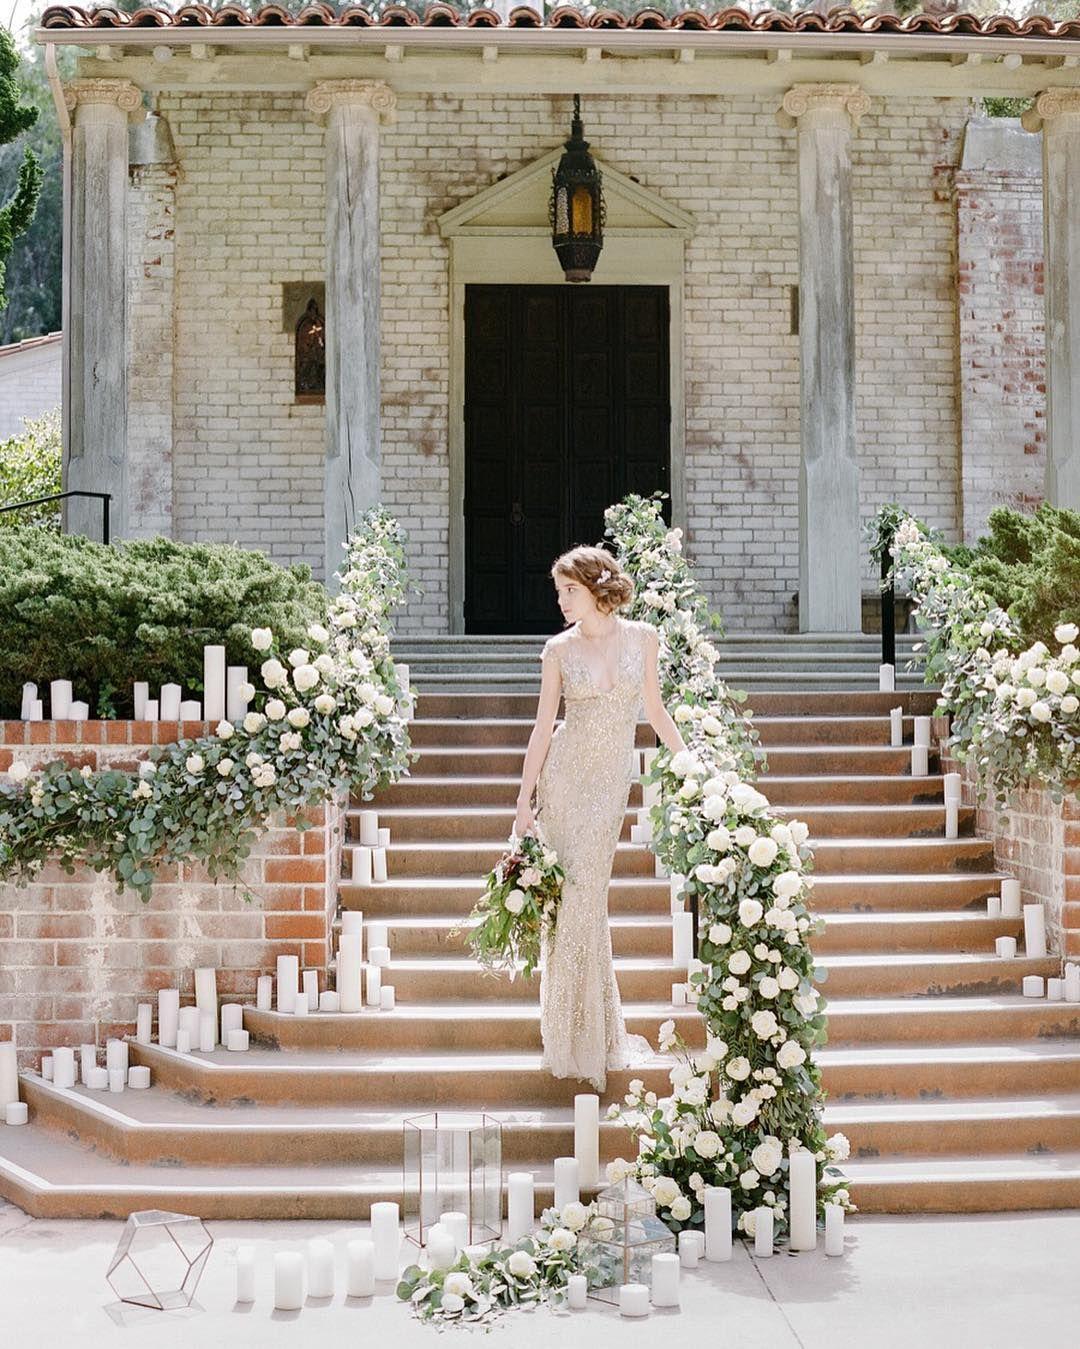 The Best Wedding Flowers Outrageous Wedding Floral Arrangements